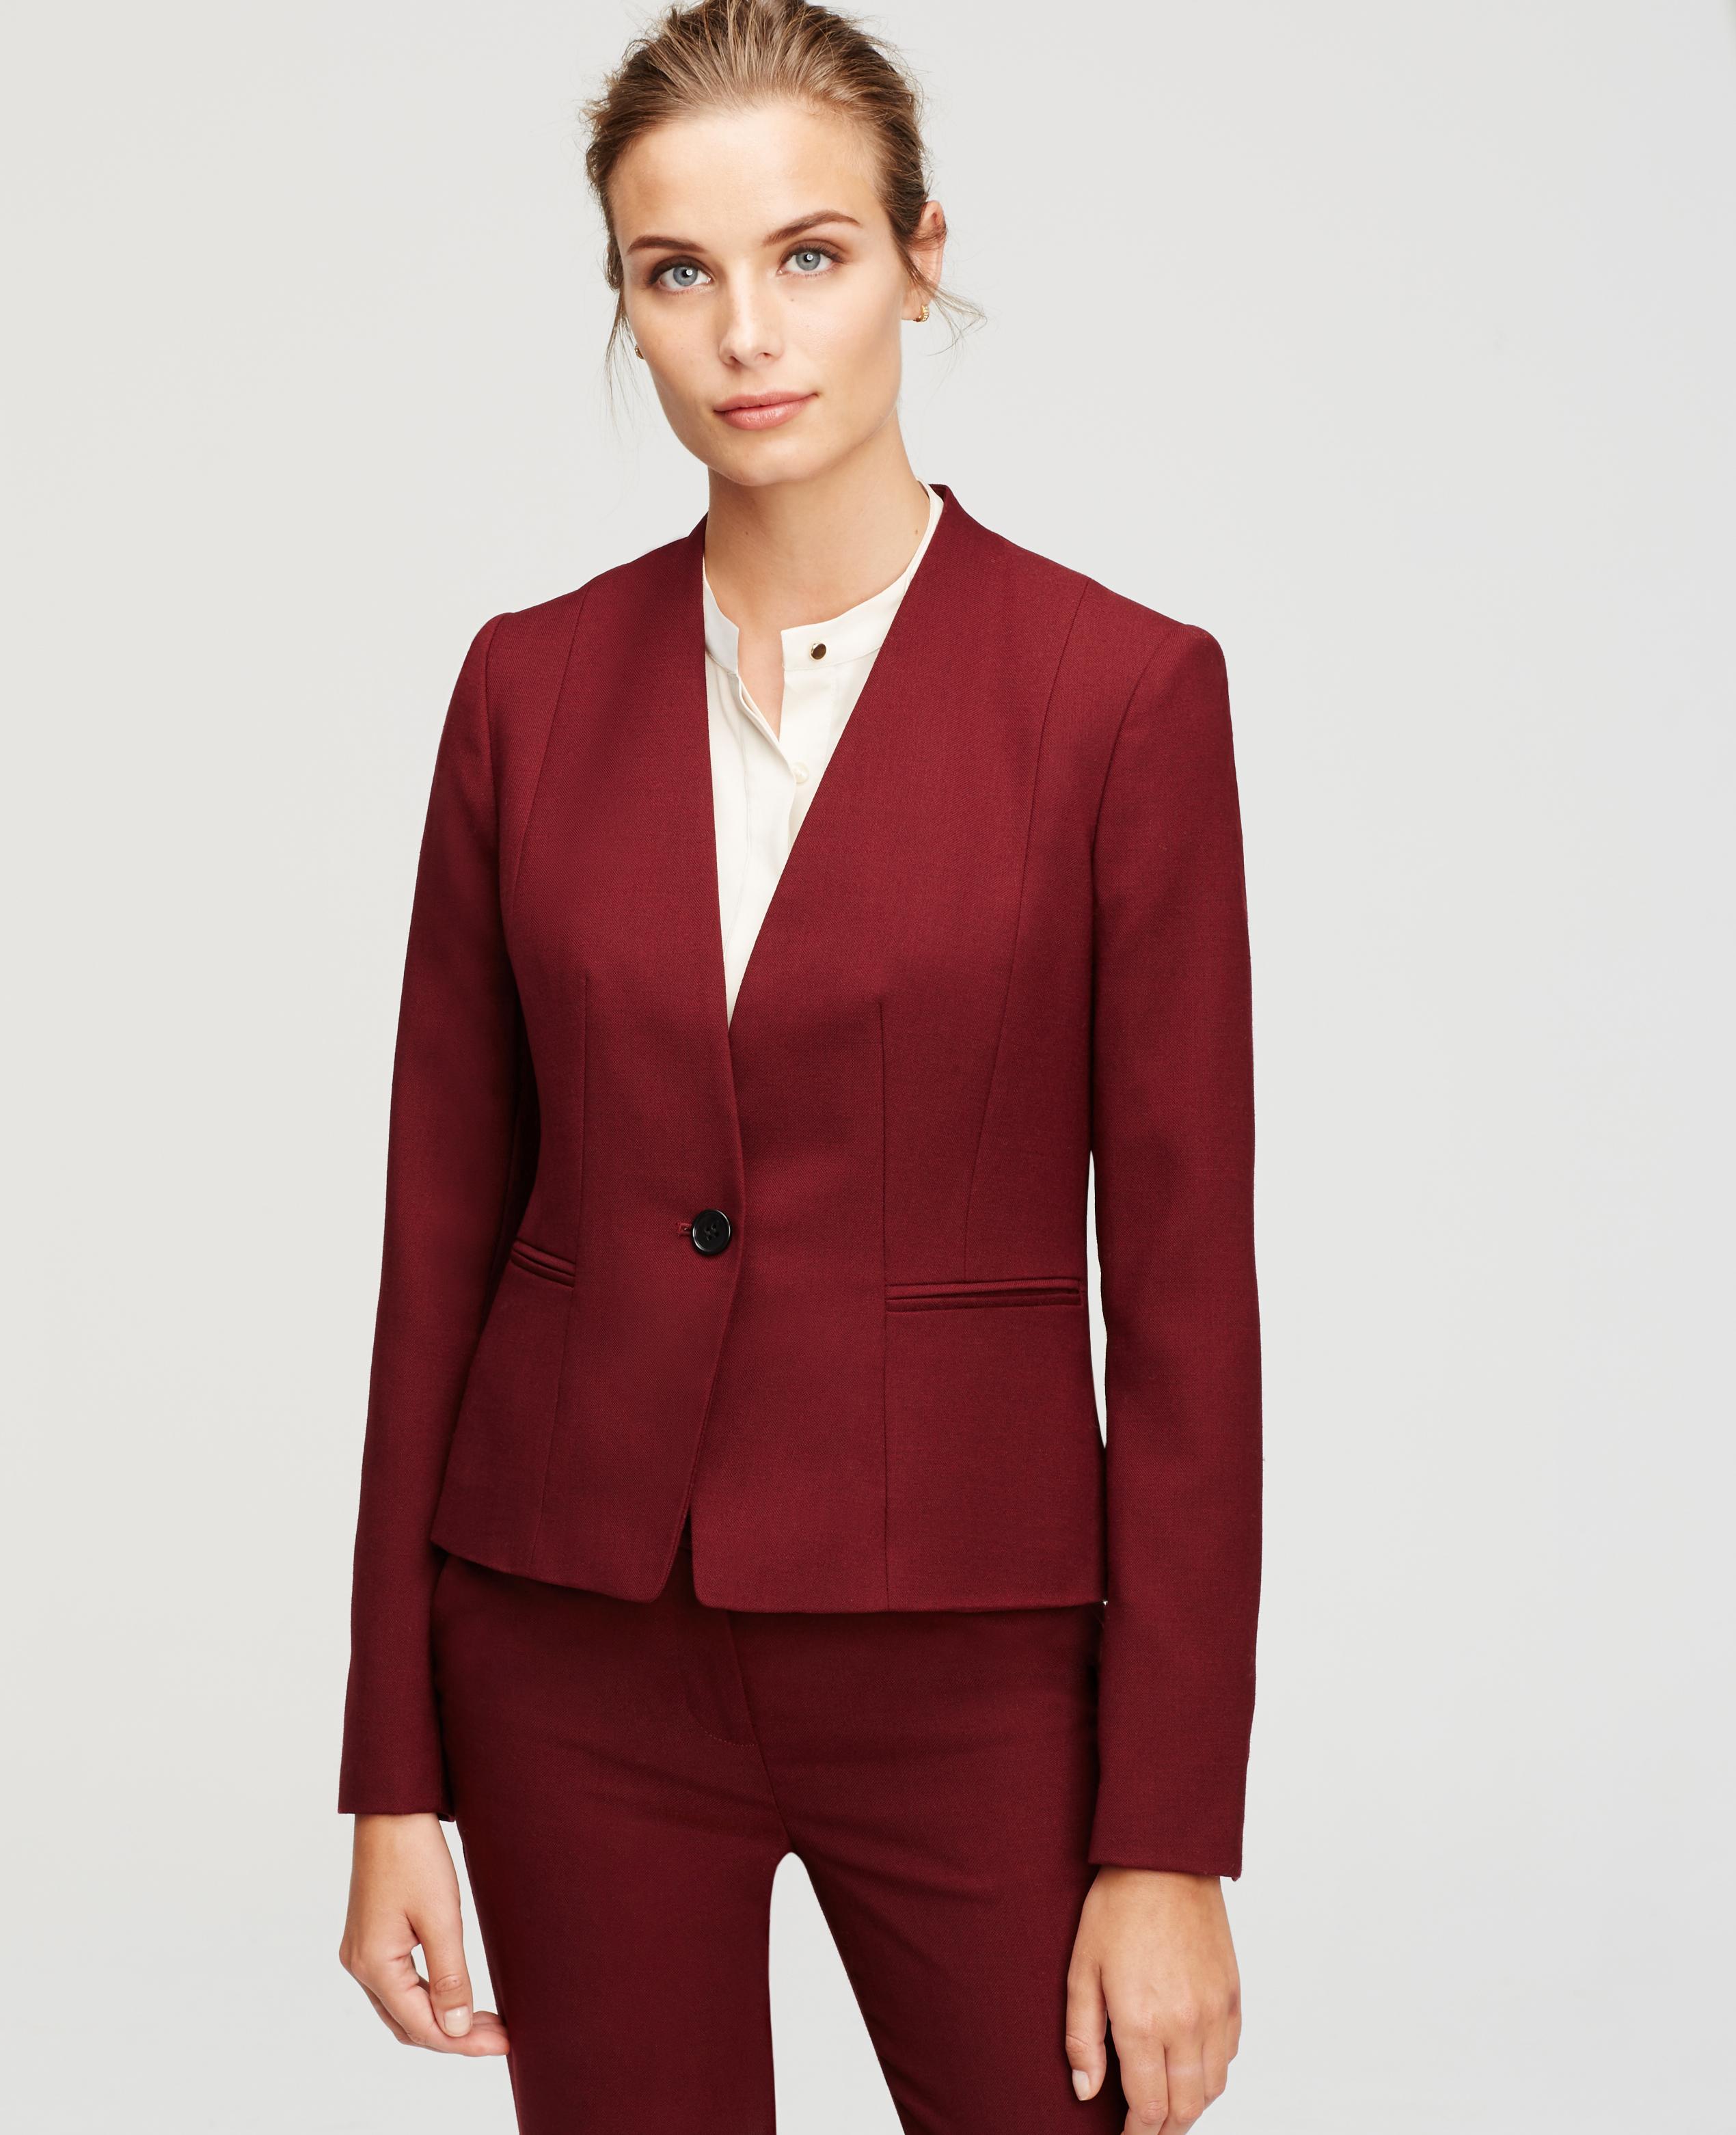 Black textured collarless jacket